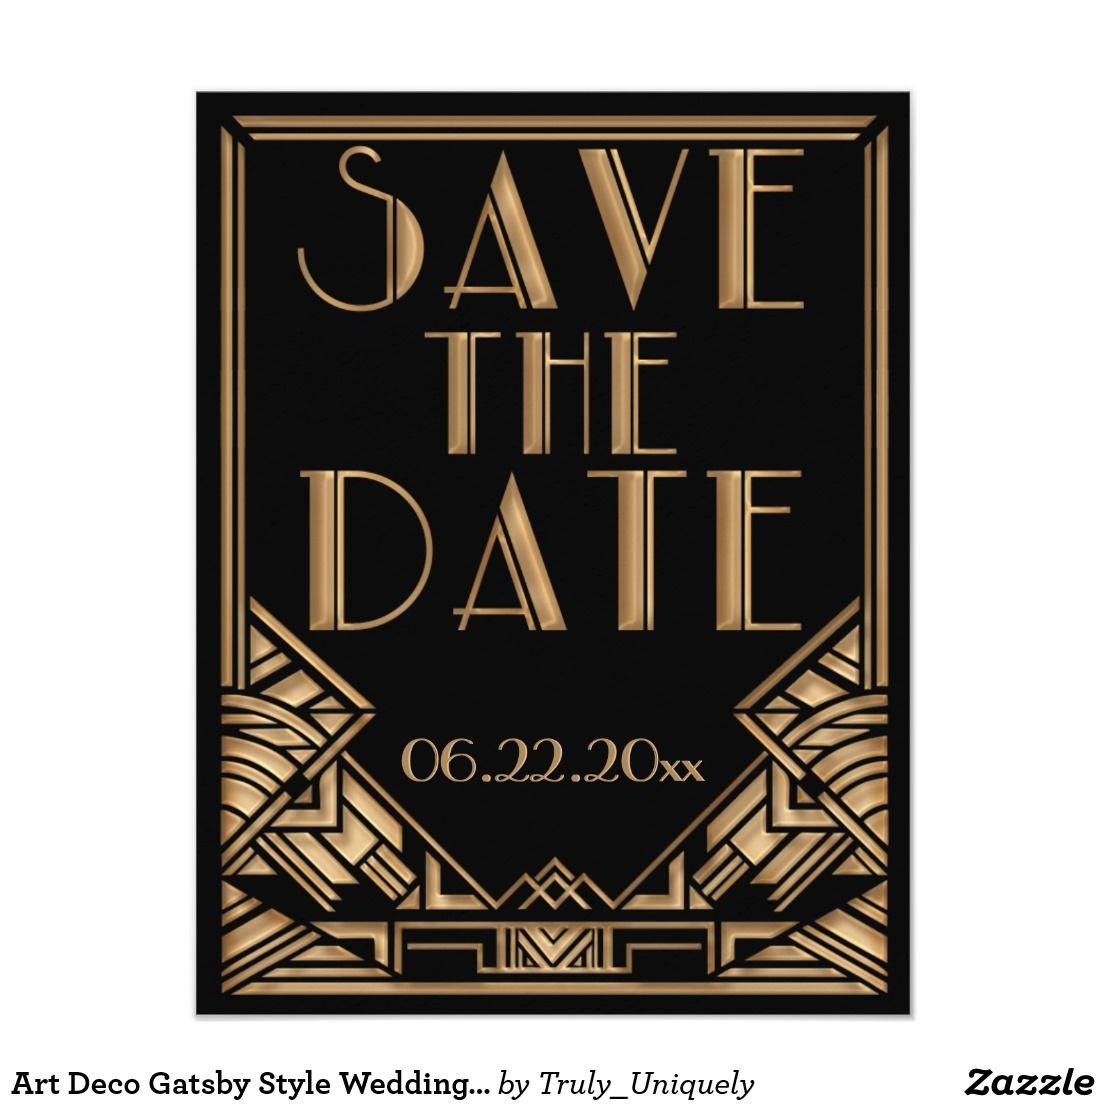 Art Deco Gatsby Style Wedding Save the Date | Zazzle.com